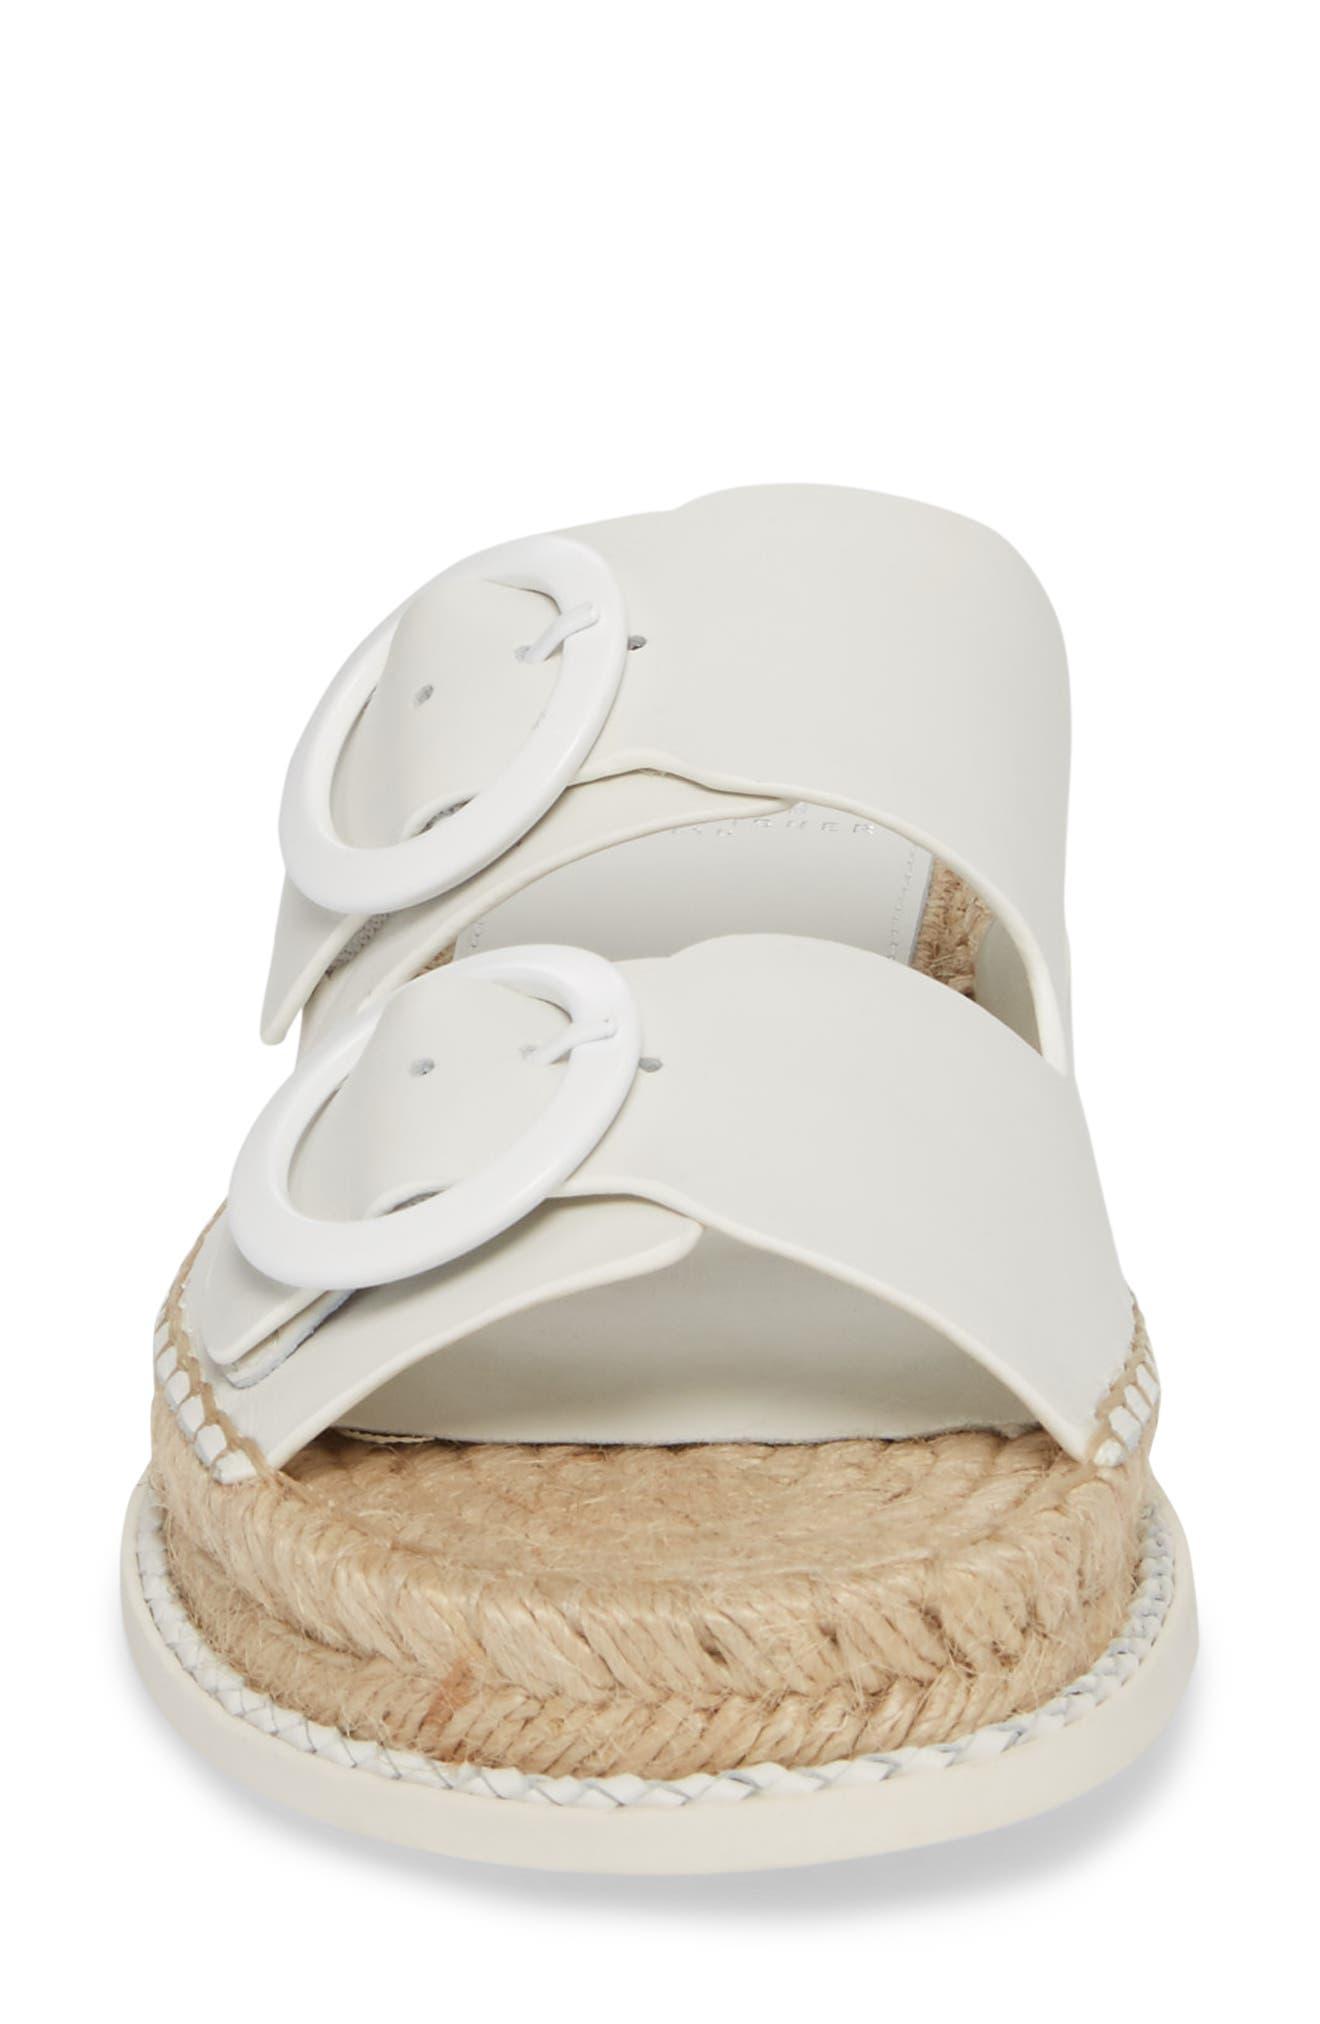 Ramba Espadrille Slide Sandal,                             Alternate thumbnail 4, color,                             White Leather